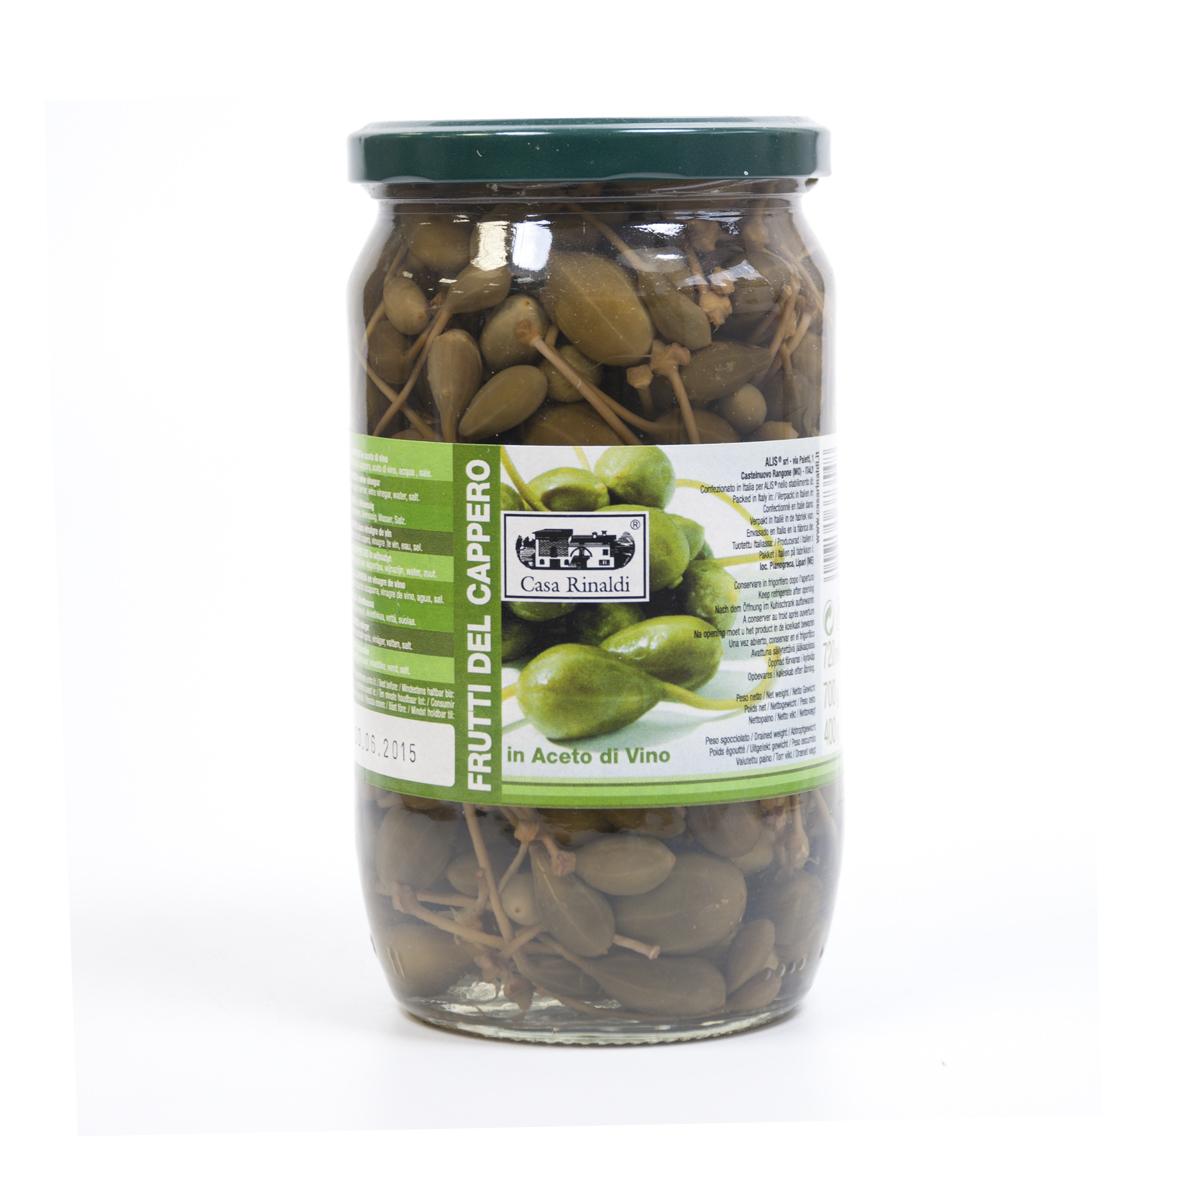 Каперсы Casa Rinaldi на веточке (плоды каперсов) 700 гр